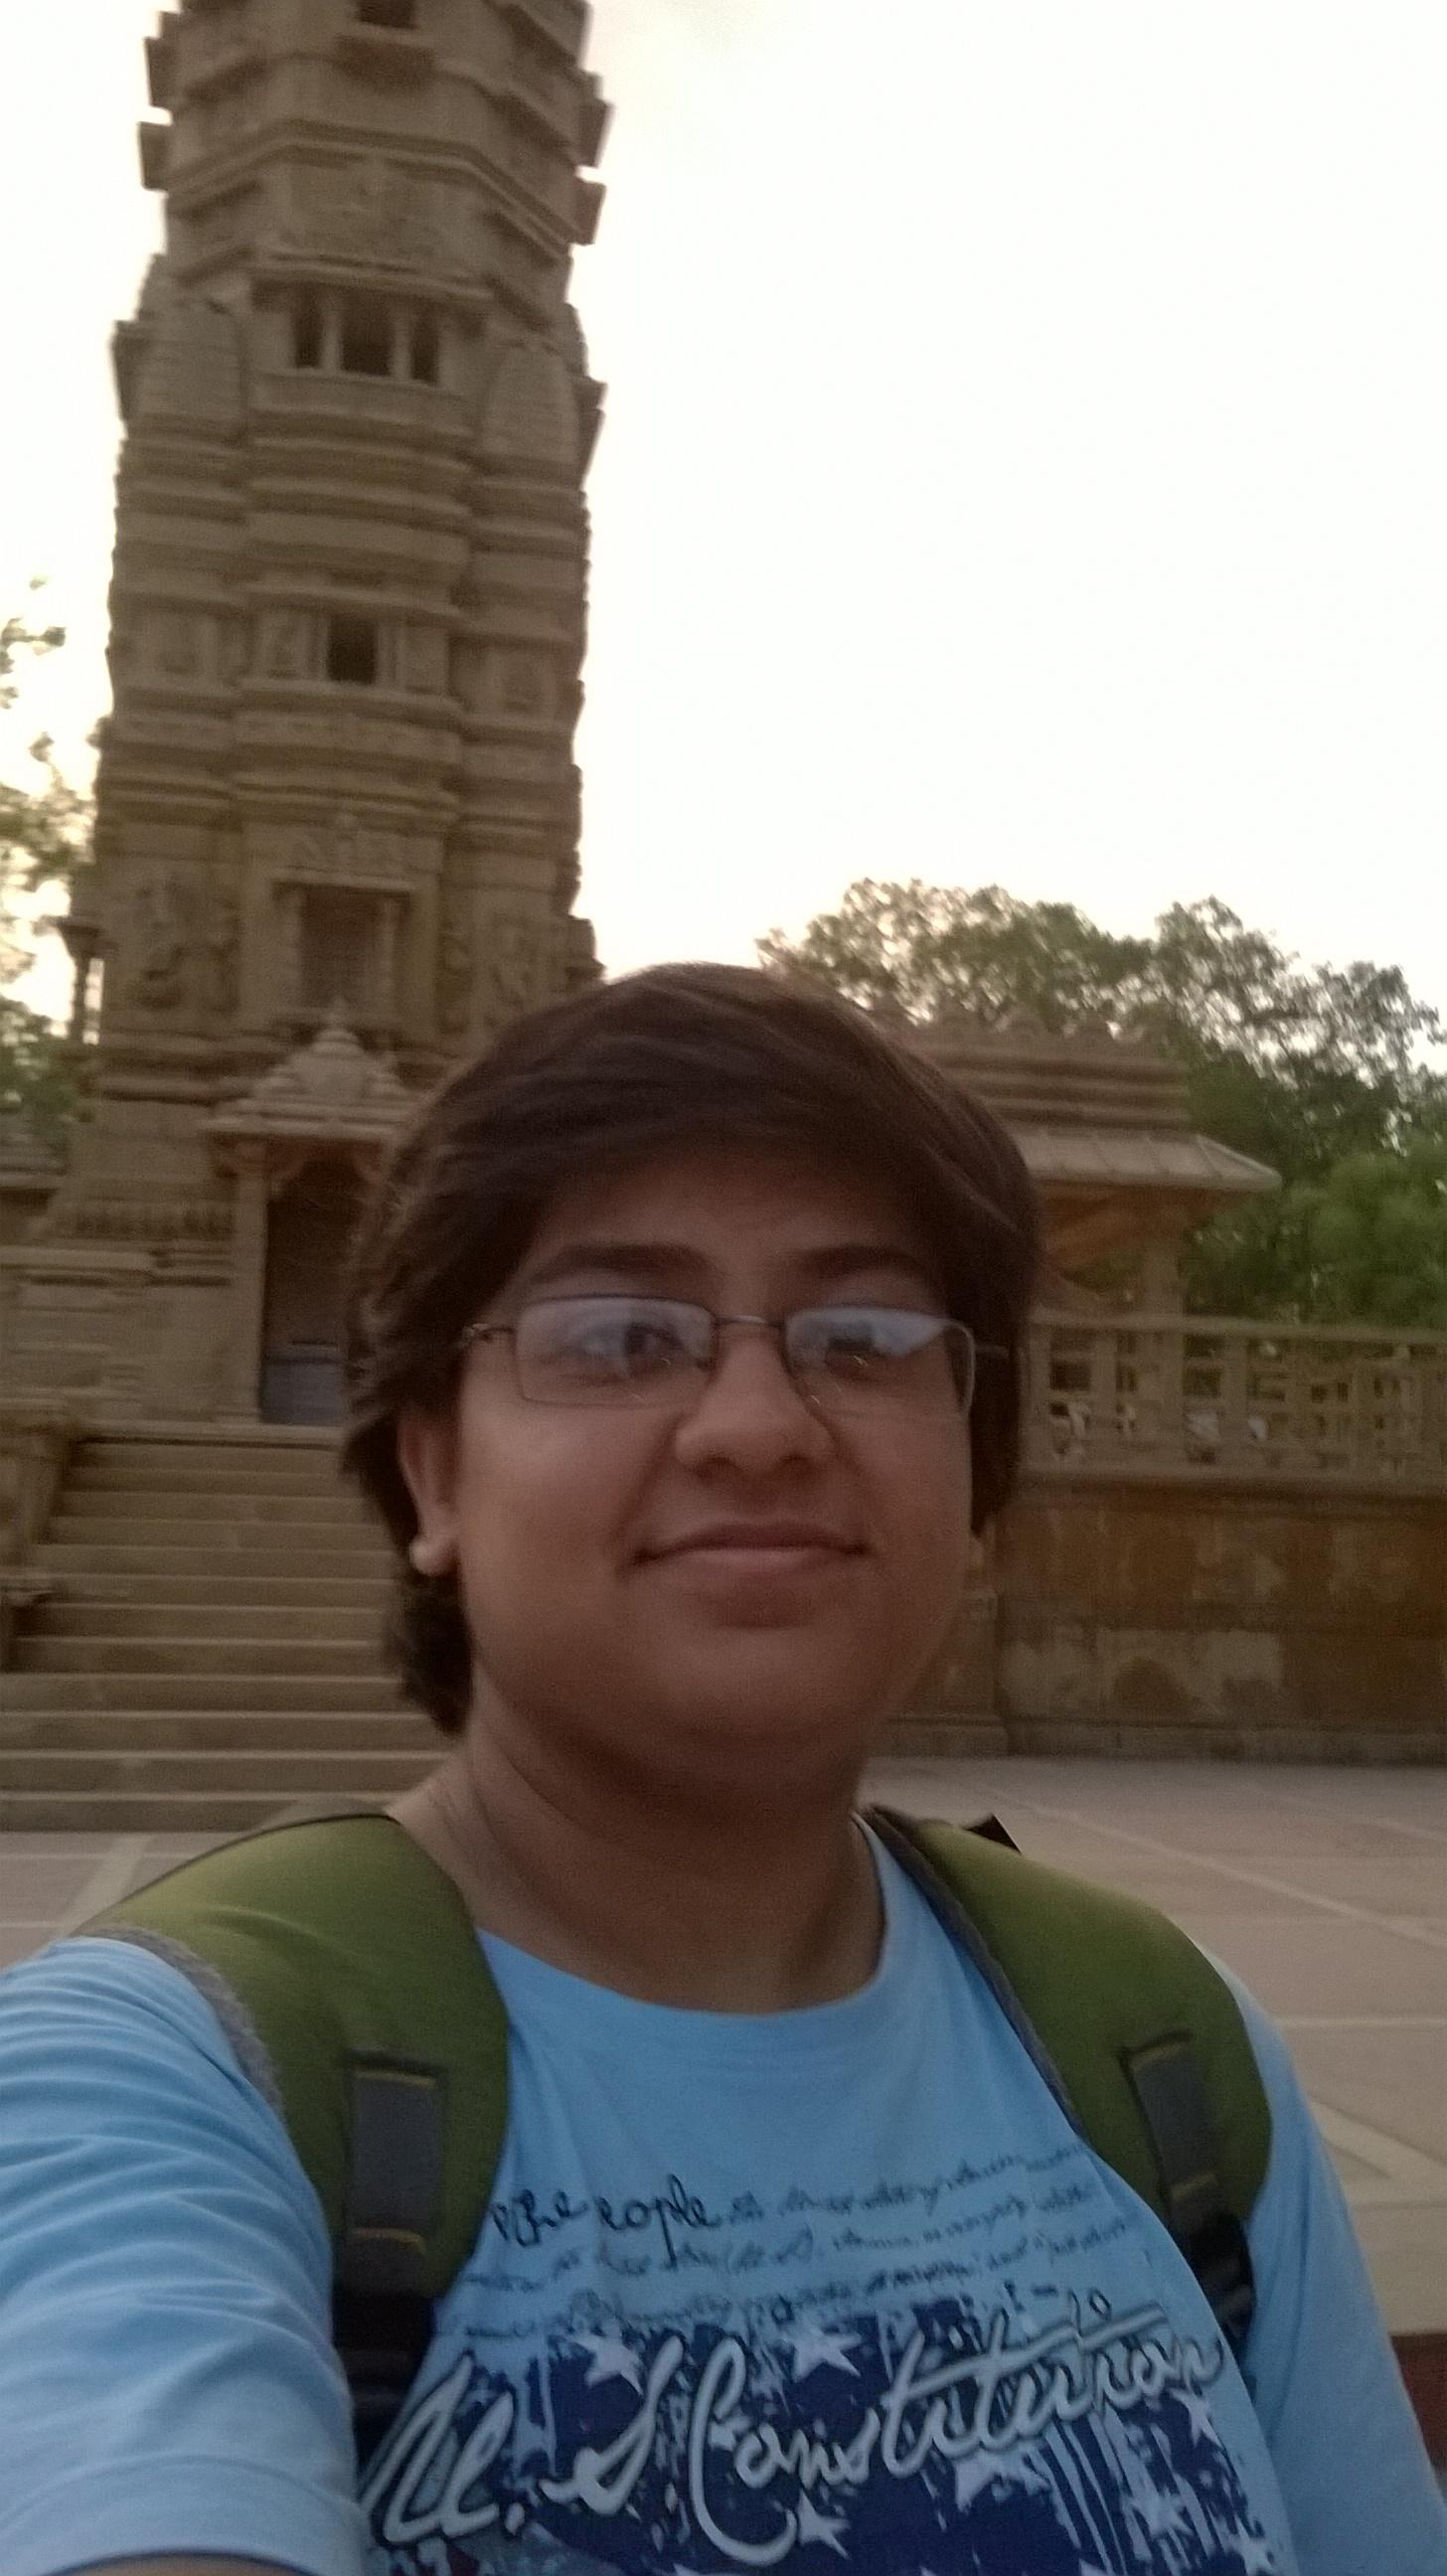 Glory Of Ahmedabad - Hathisingh na mandir shivangi motwani